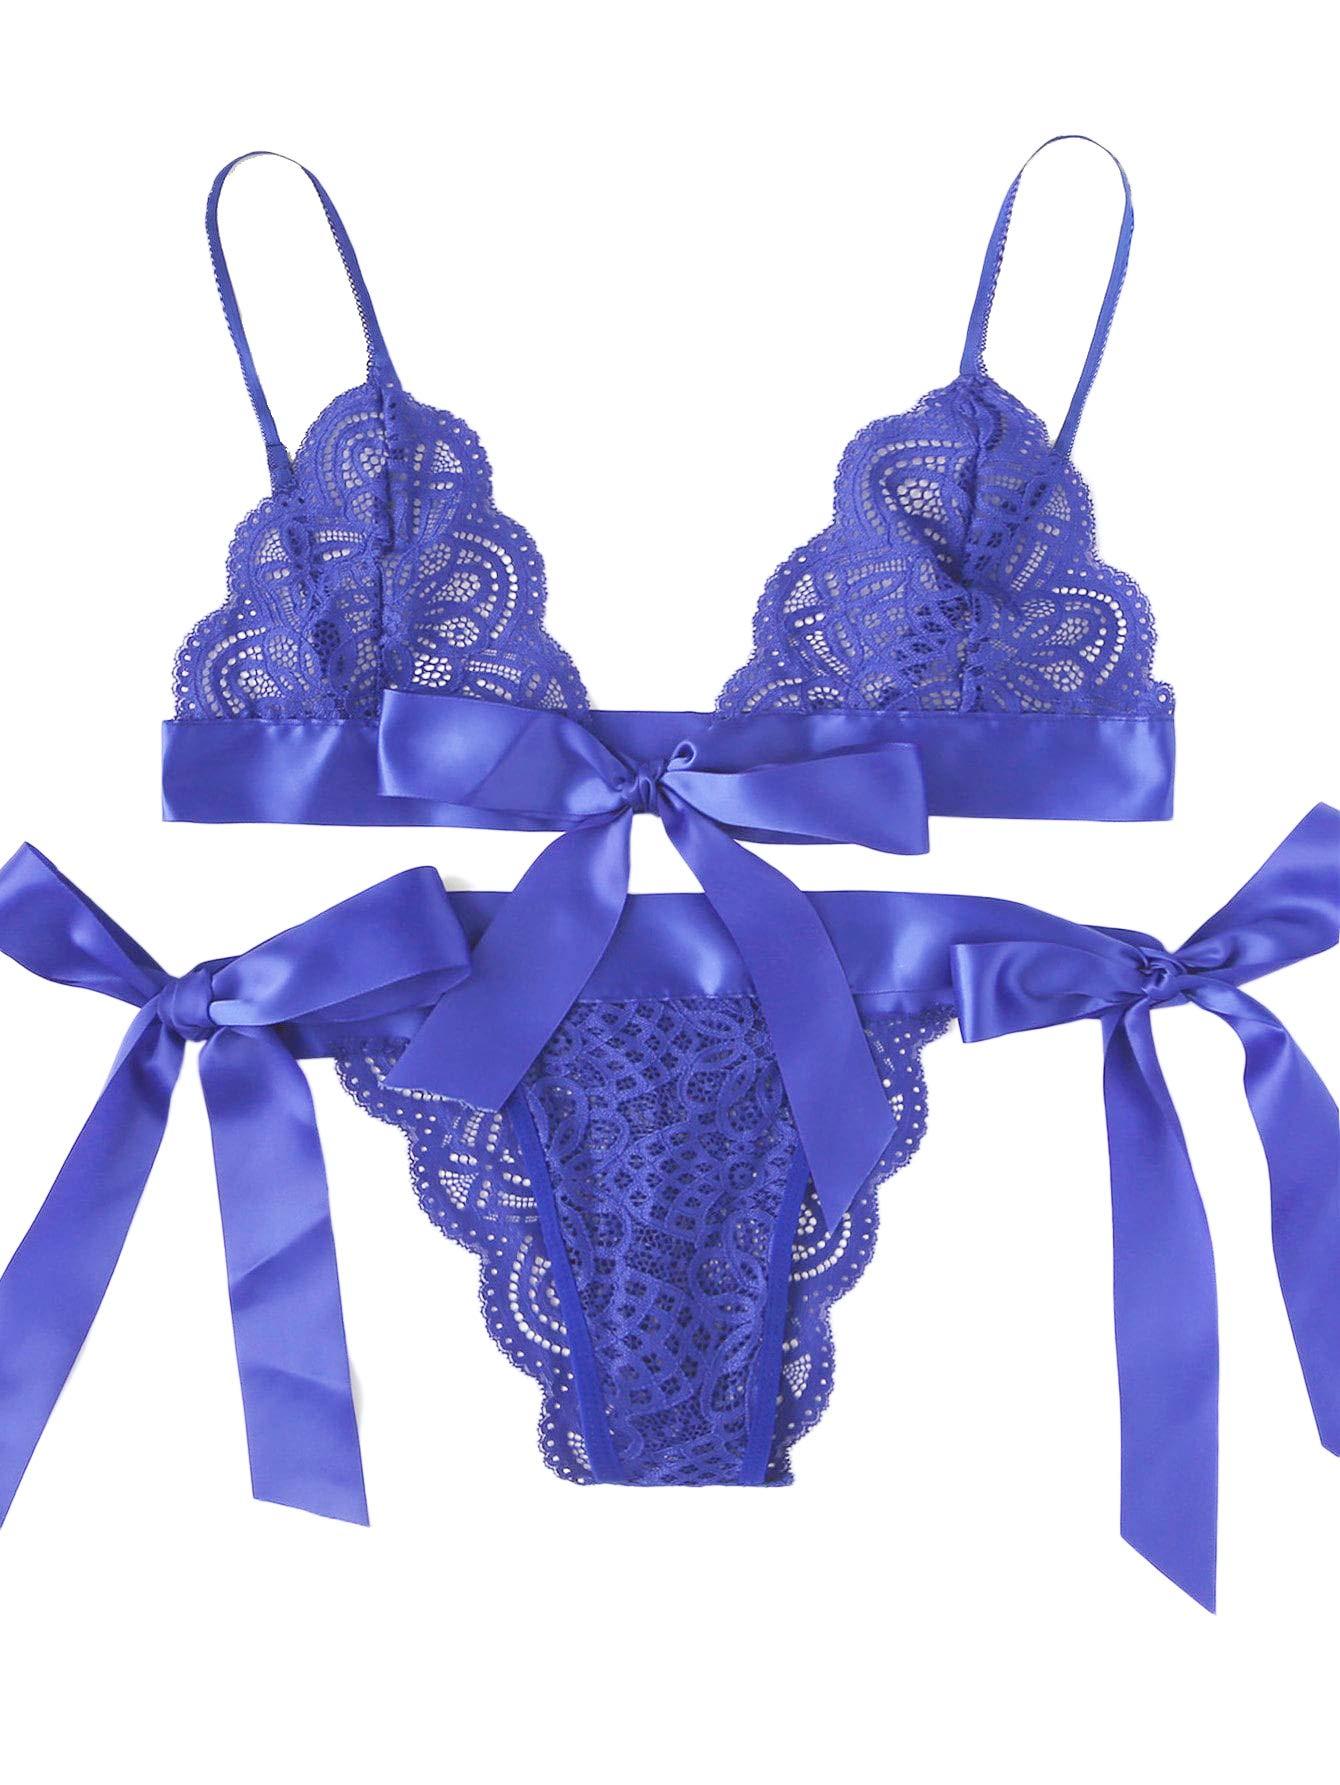 b7a5dd97fd4 Galleon - SweatyRocks Women s 2 Piece Sexy Lace Strap Bralette Bra And Panty  Lingerie Set Dark Blue S